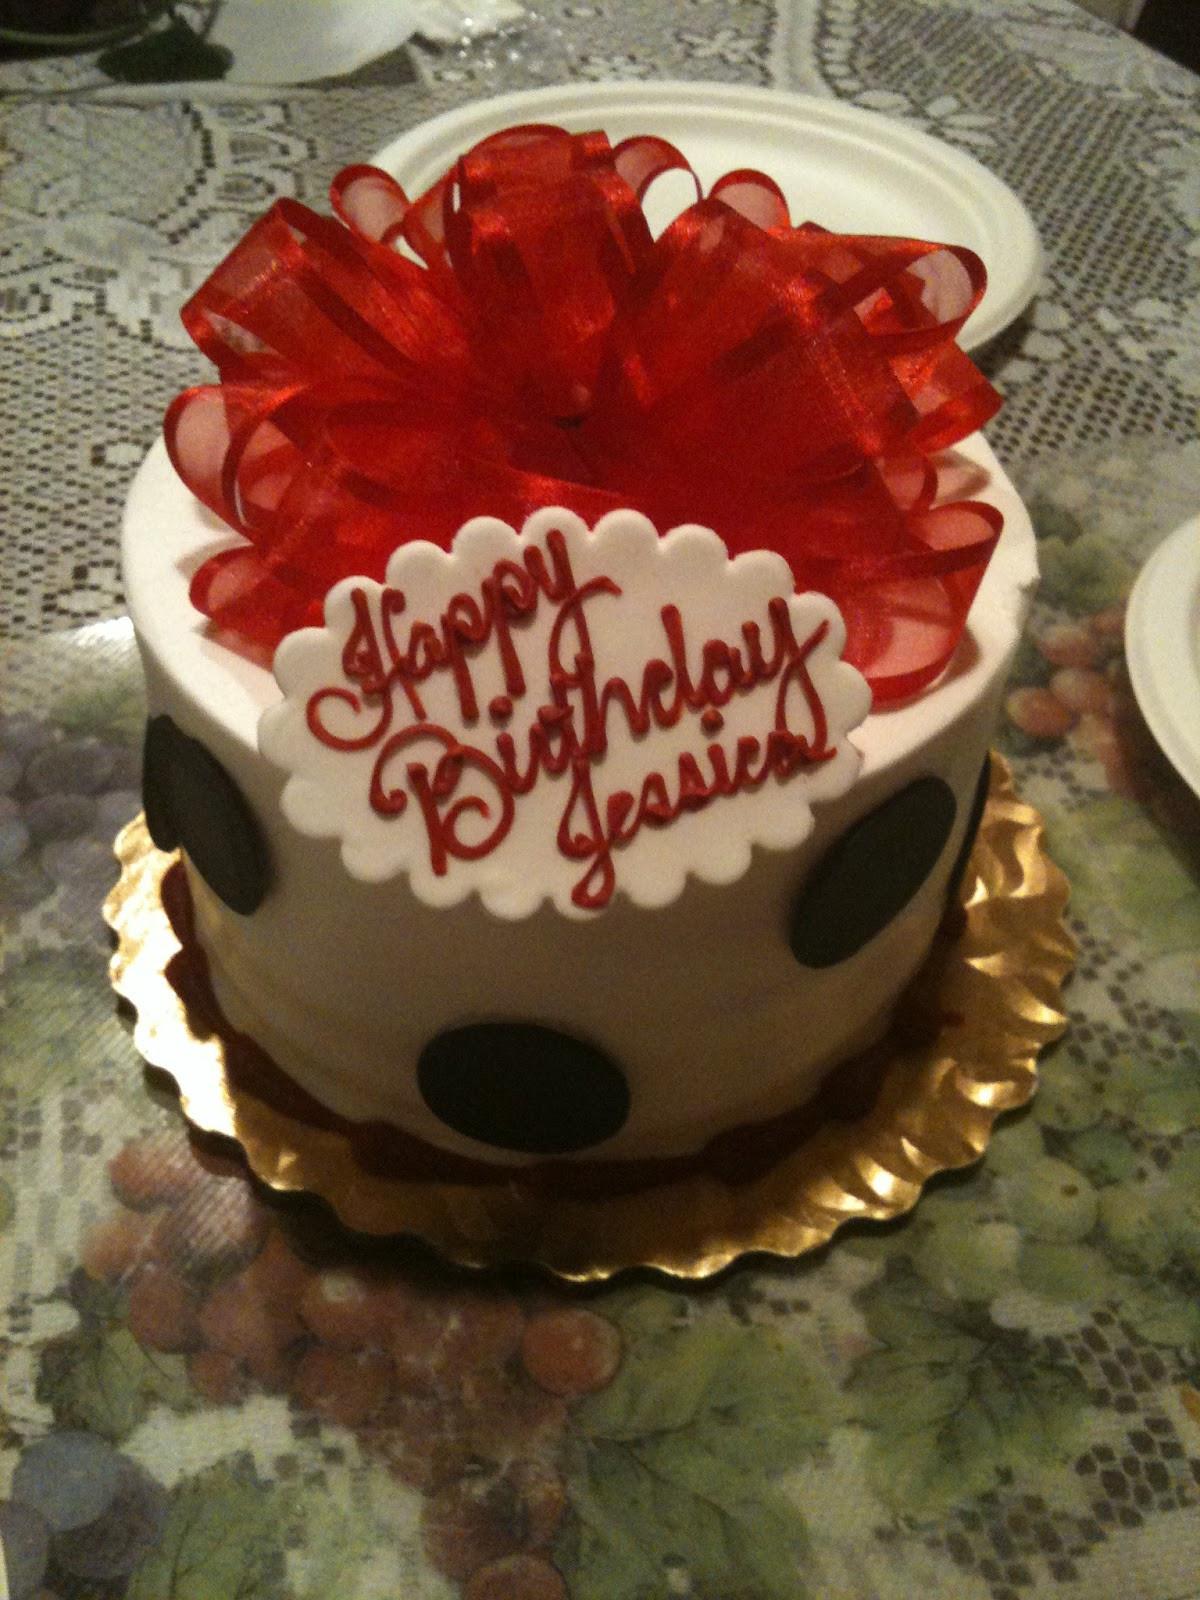 Best ideas about Happy Birthday Jessica Cake . Save or Pin Lily hotnails Happy Birthday Jessica Now.